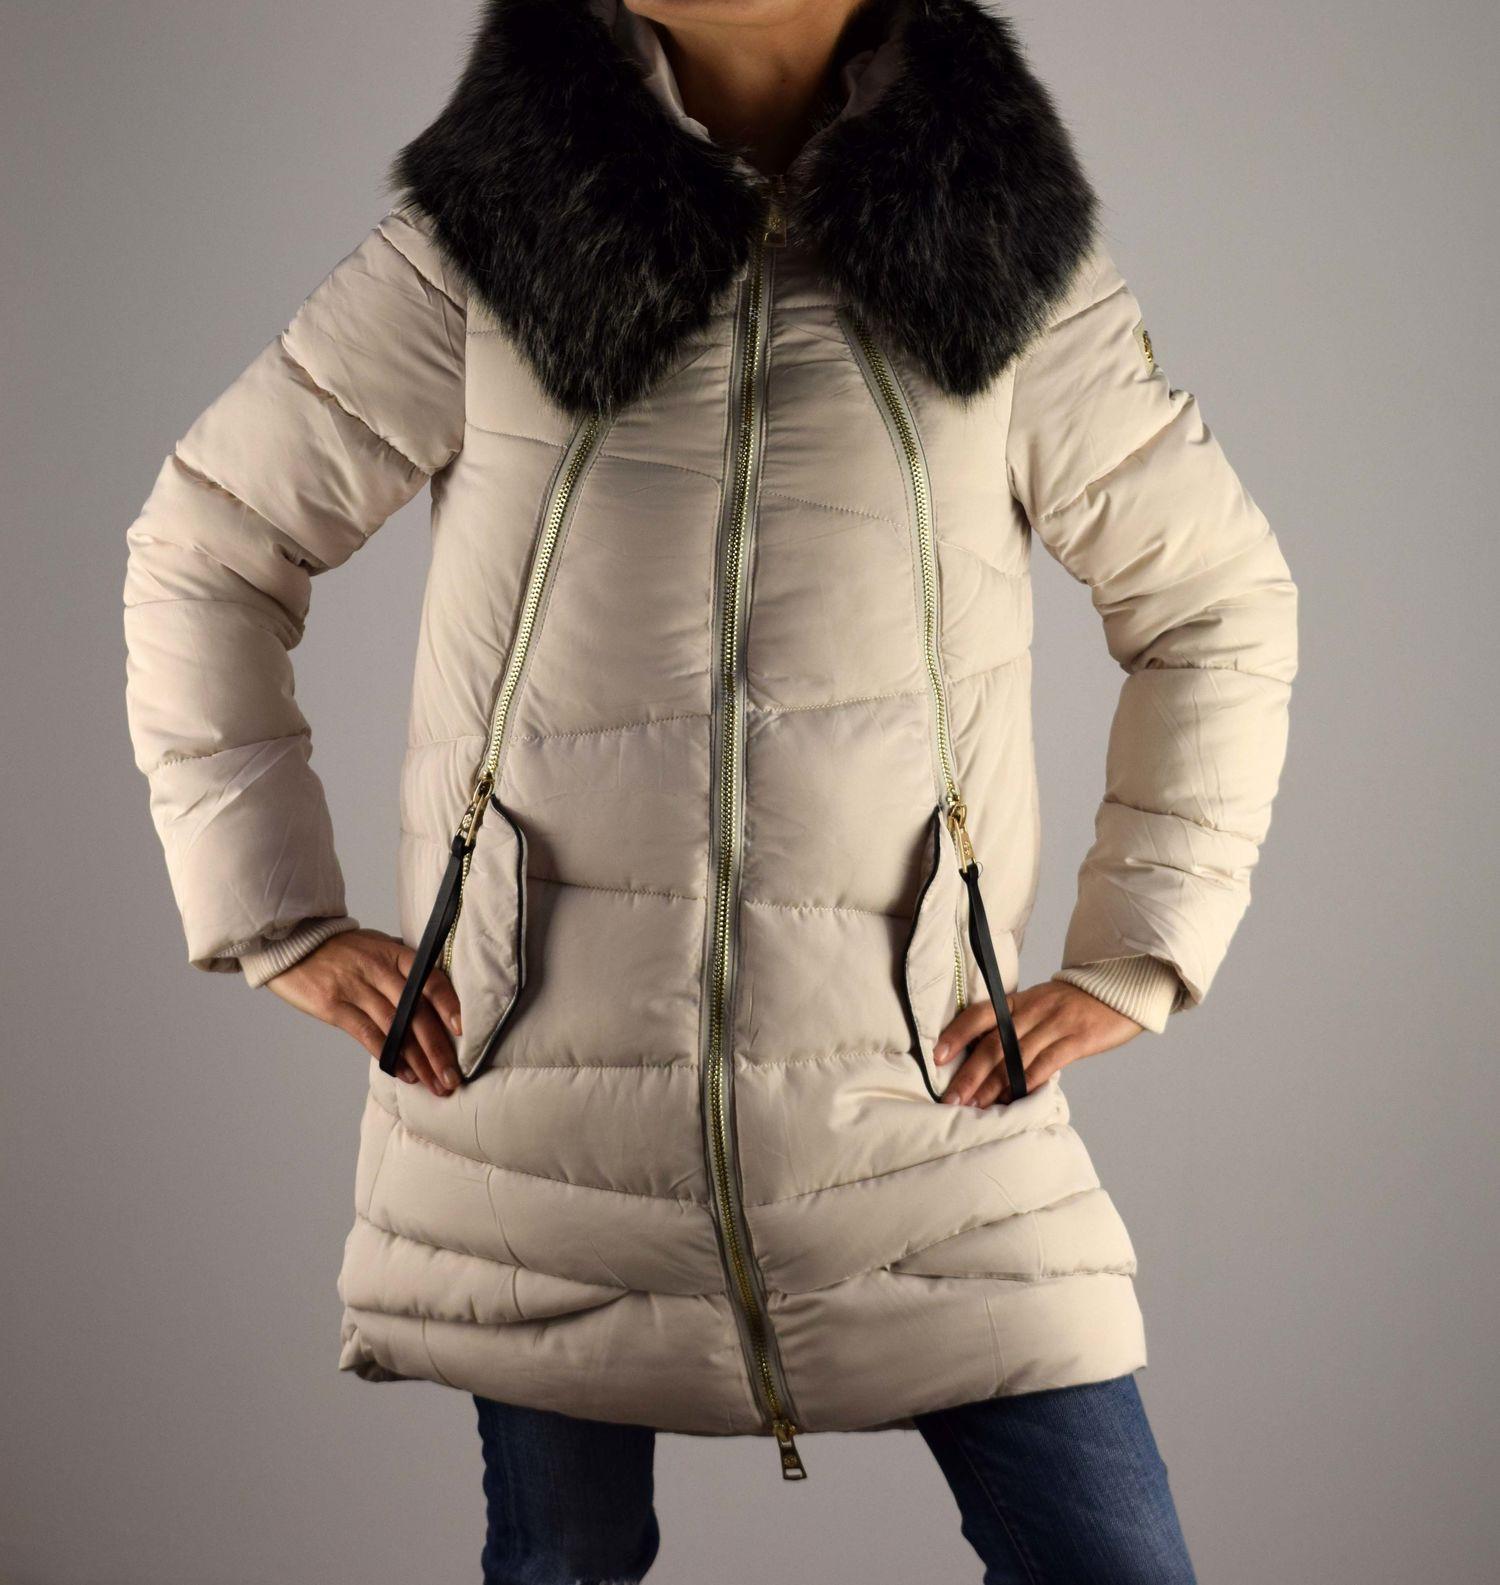 5fba77c7969 Дамско зимно яке - 1607 - екрю - Alis.bg - Fashion & Style